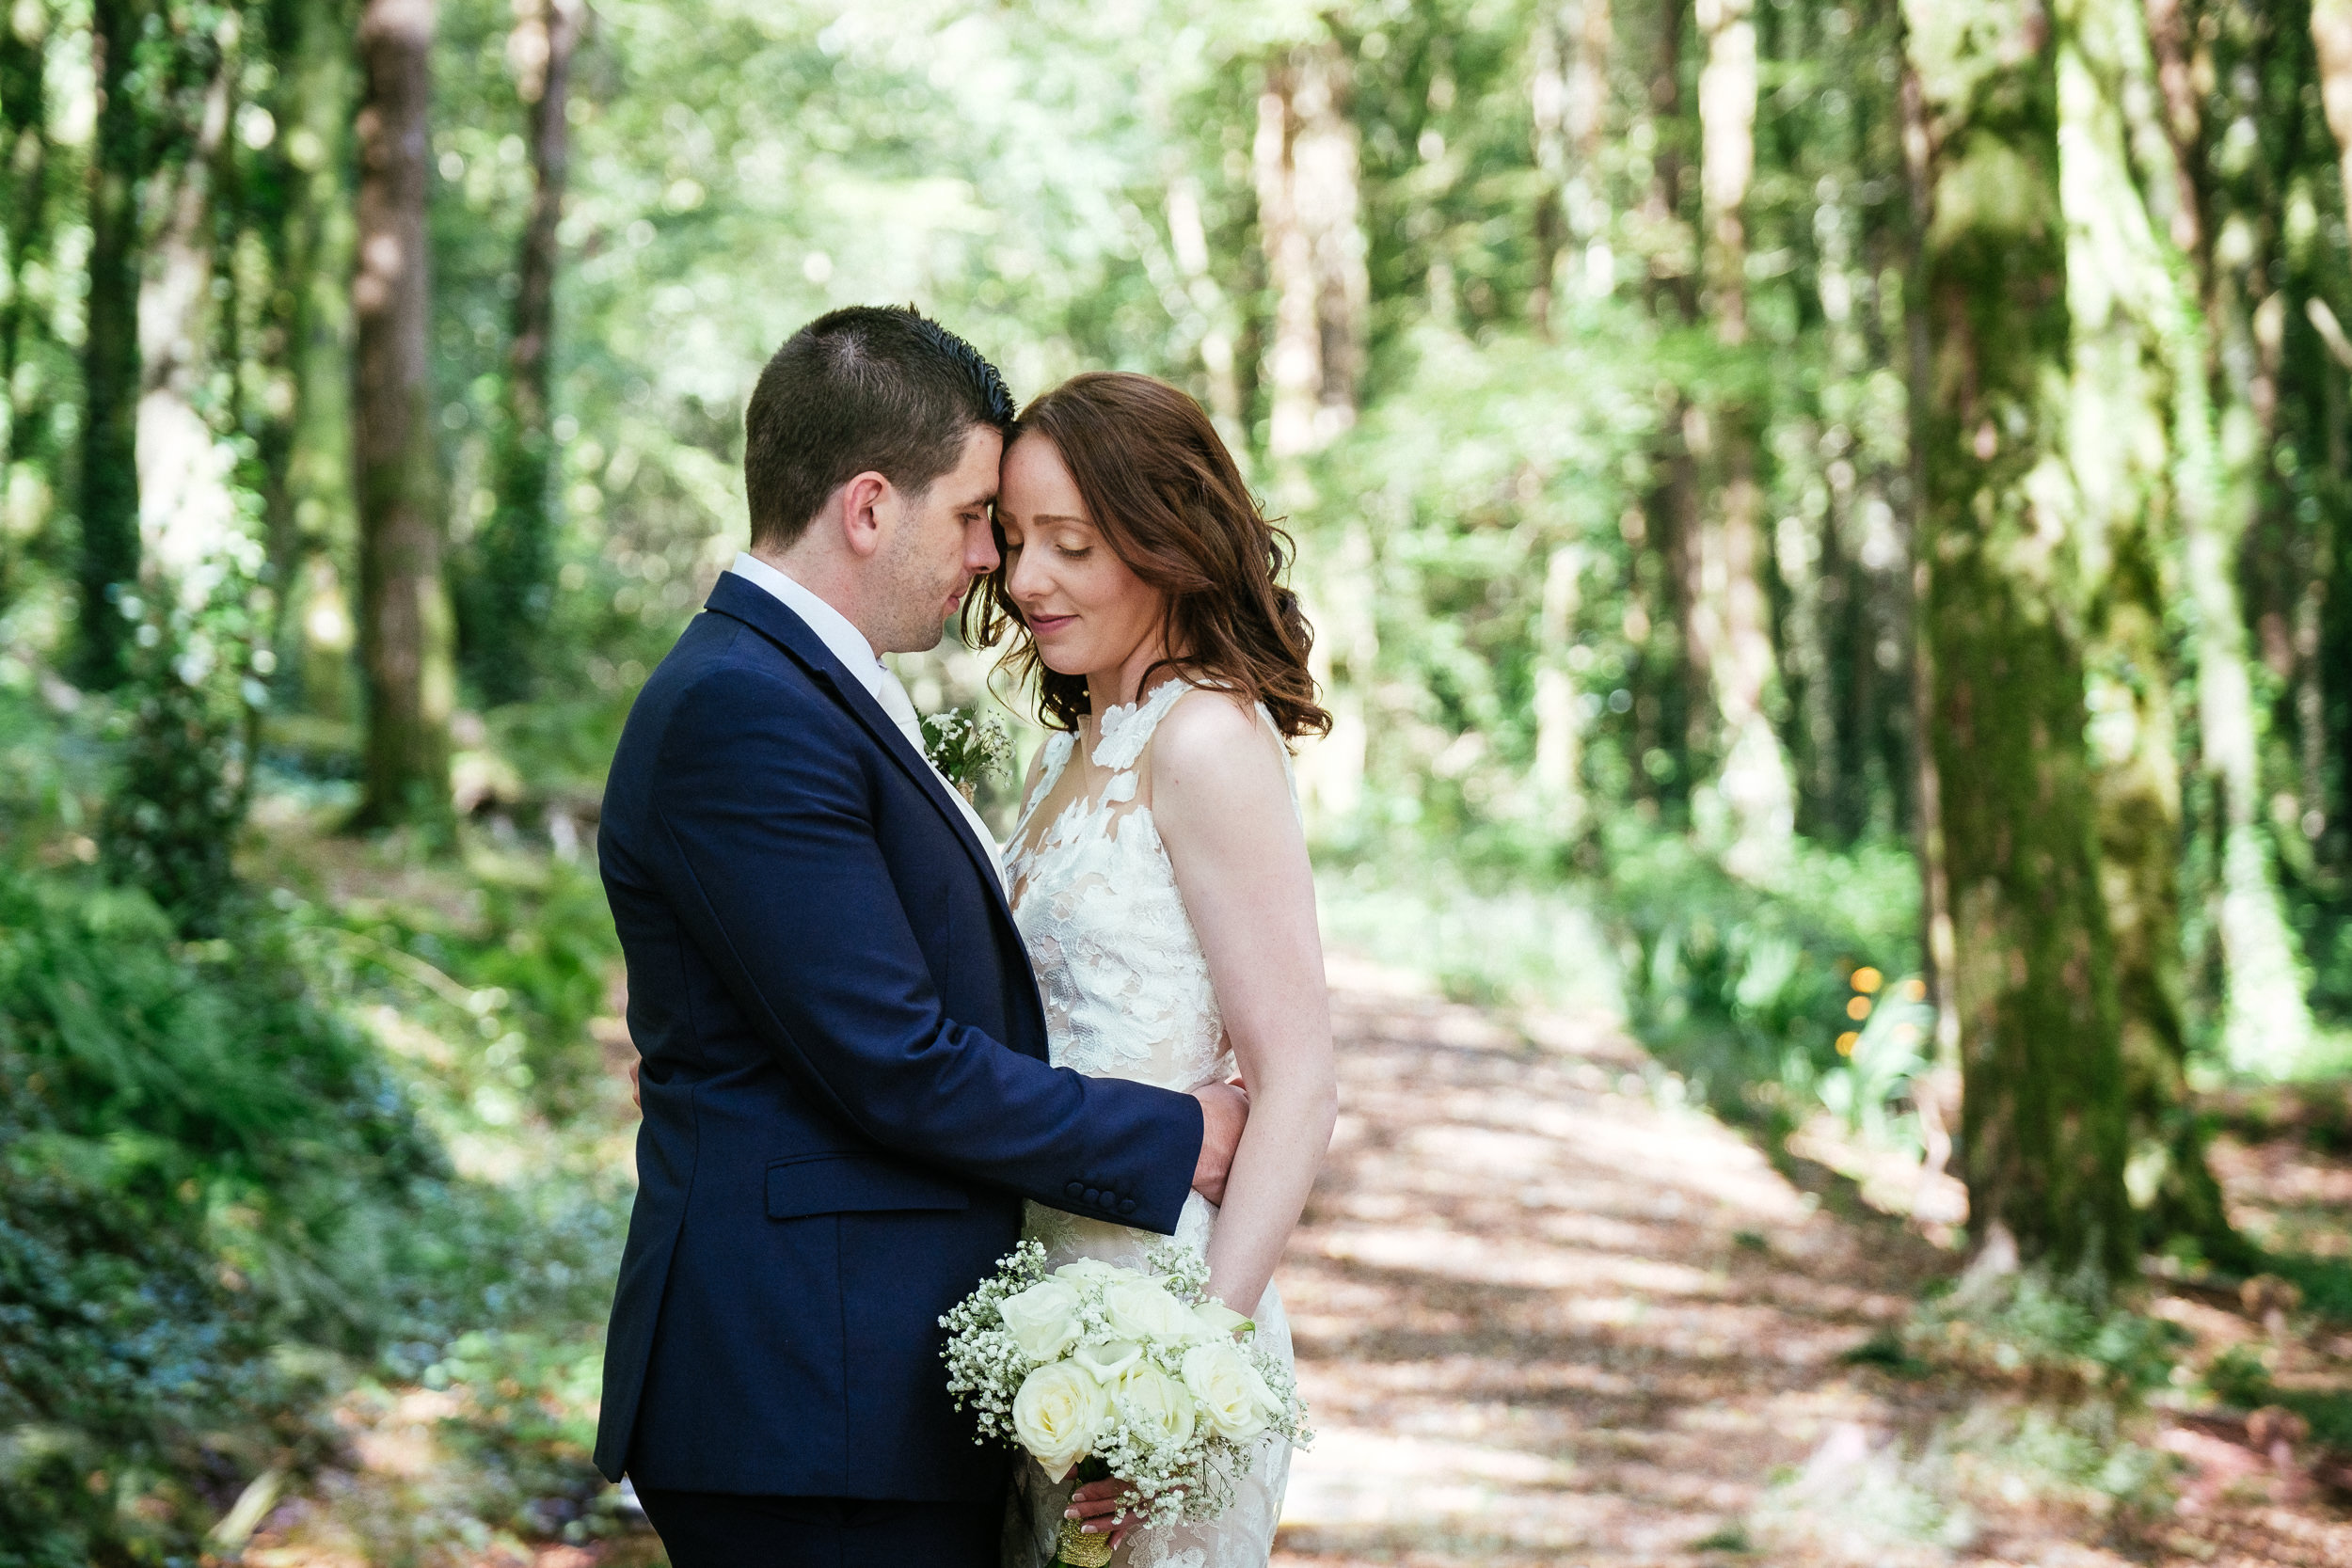 Dunmore House Hotel Clonakilty Cork Wedding Photographer 71